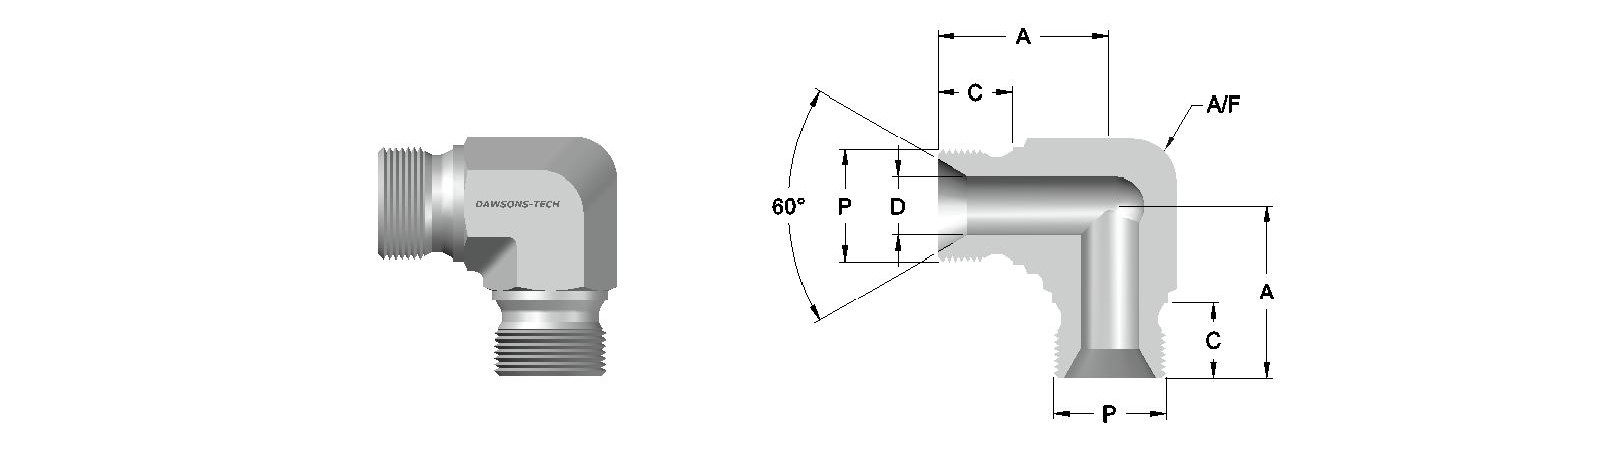 01 Male Union Elbow BSP (Parallel) Thread-Model